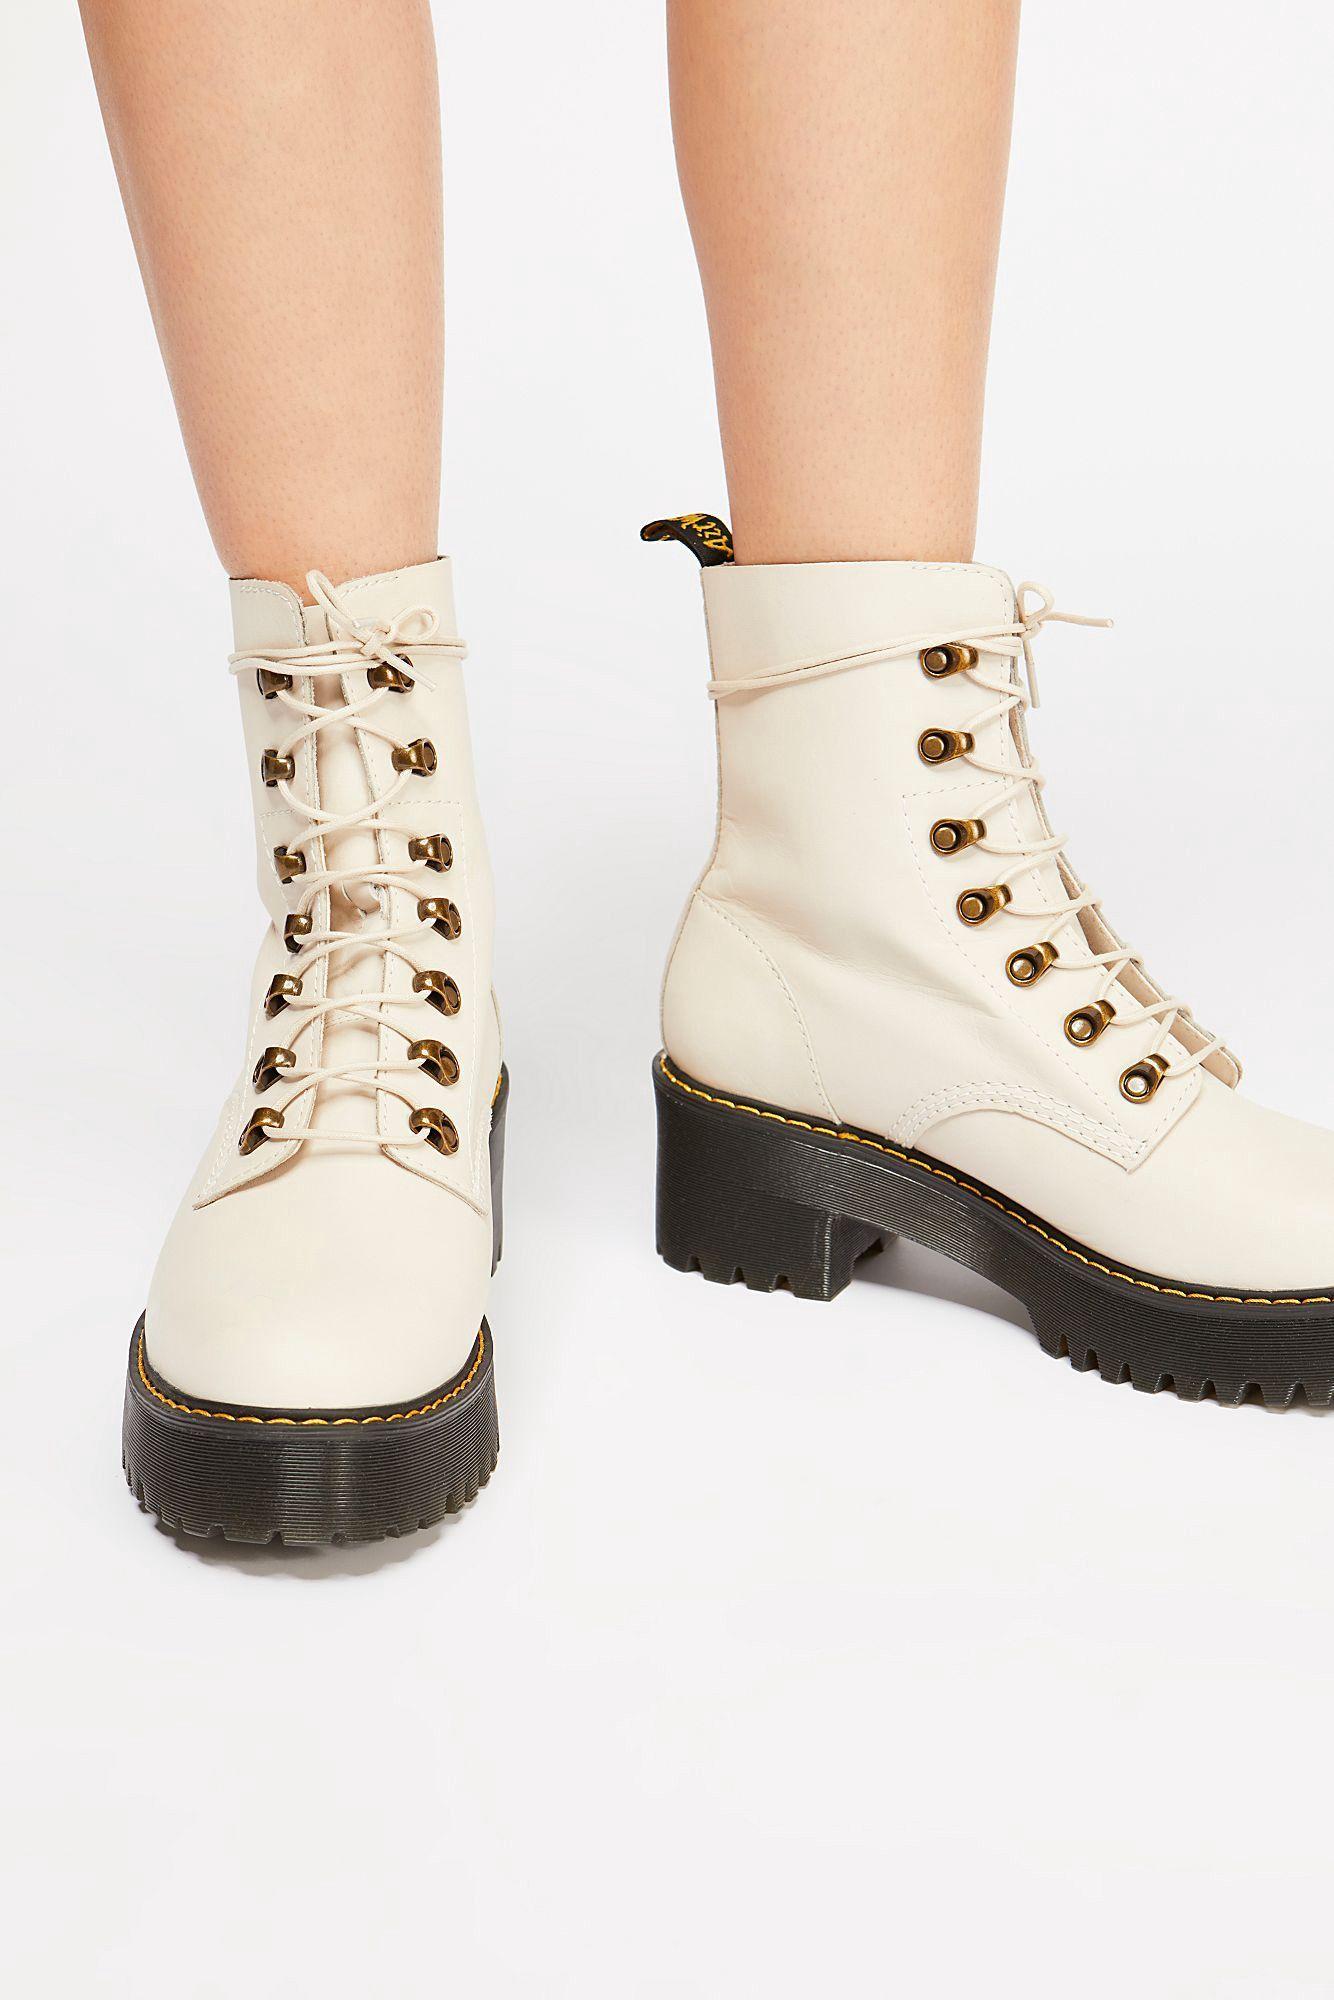 40ba67b85ee Free People Dr. Martens Leona Platform Ankle Boot - Black 9 Yellow ...